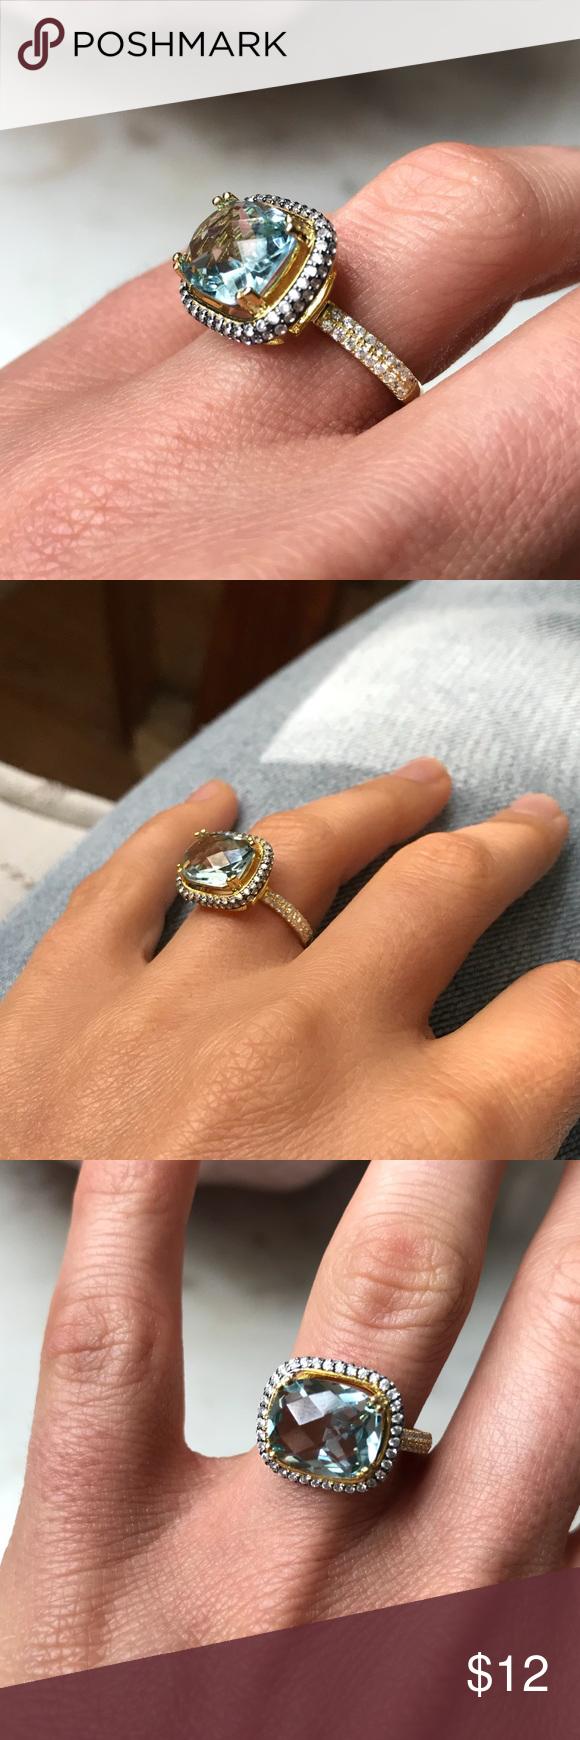 Teal Gemstone & Gold Ring Gold gemstone ring, Nordstrom